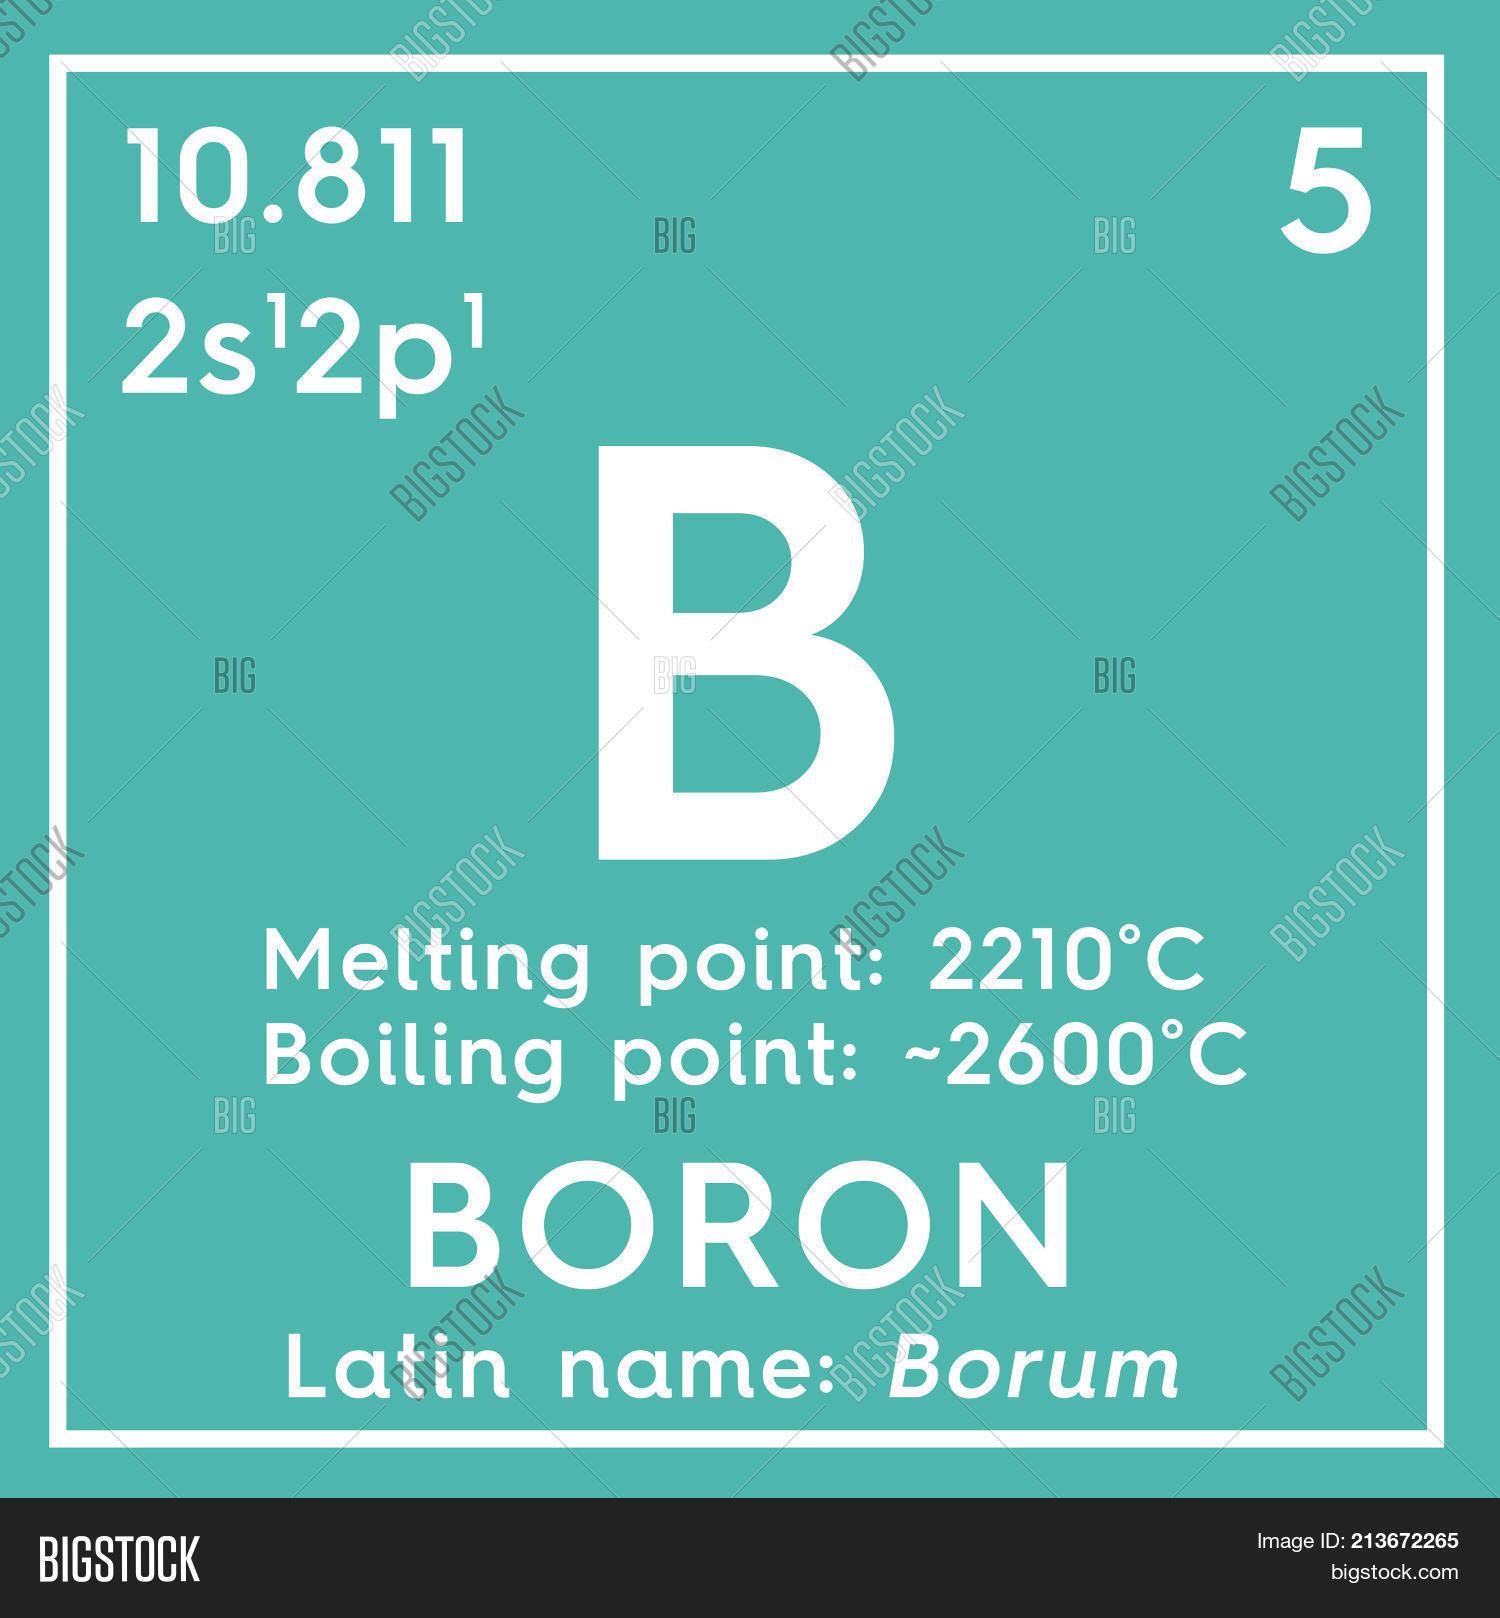 Boron Metalloids Chemical Element Of Mendeleevs Periodic Table